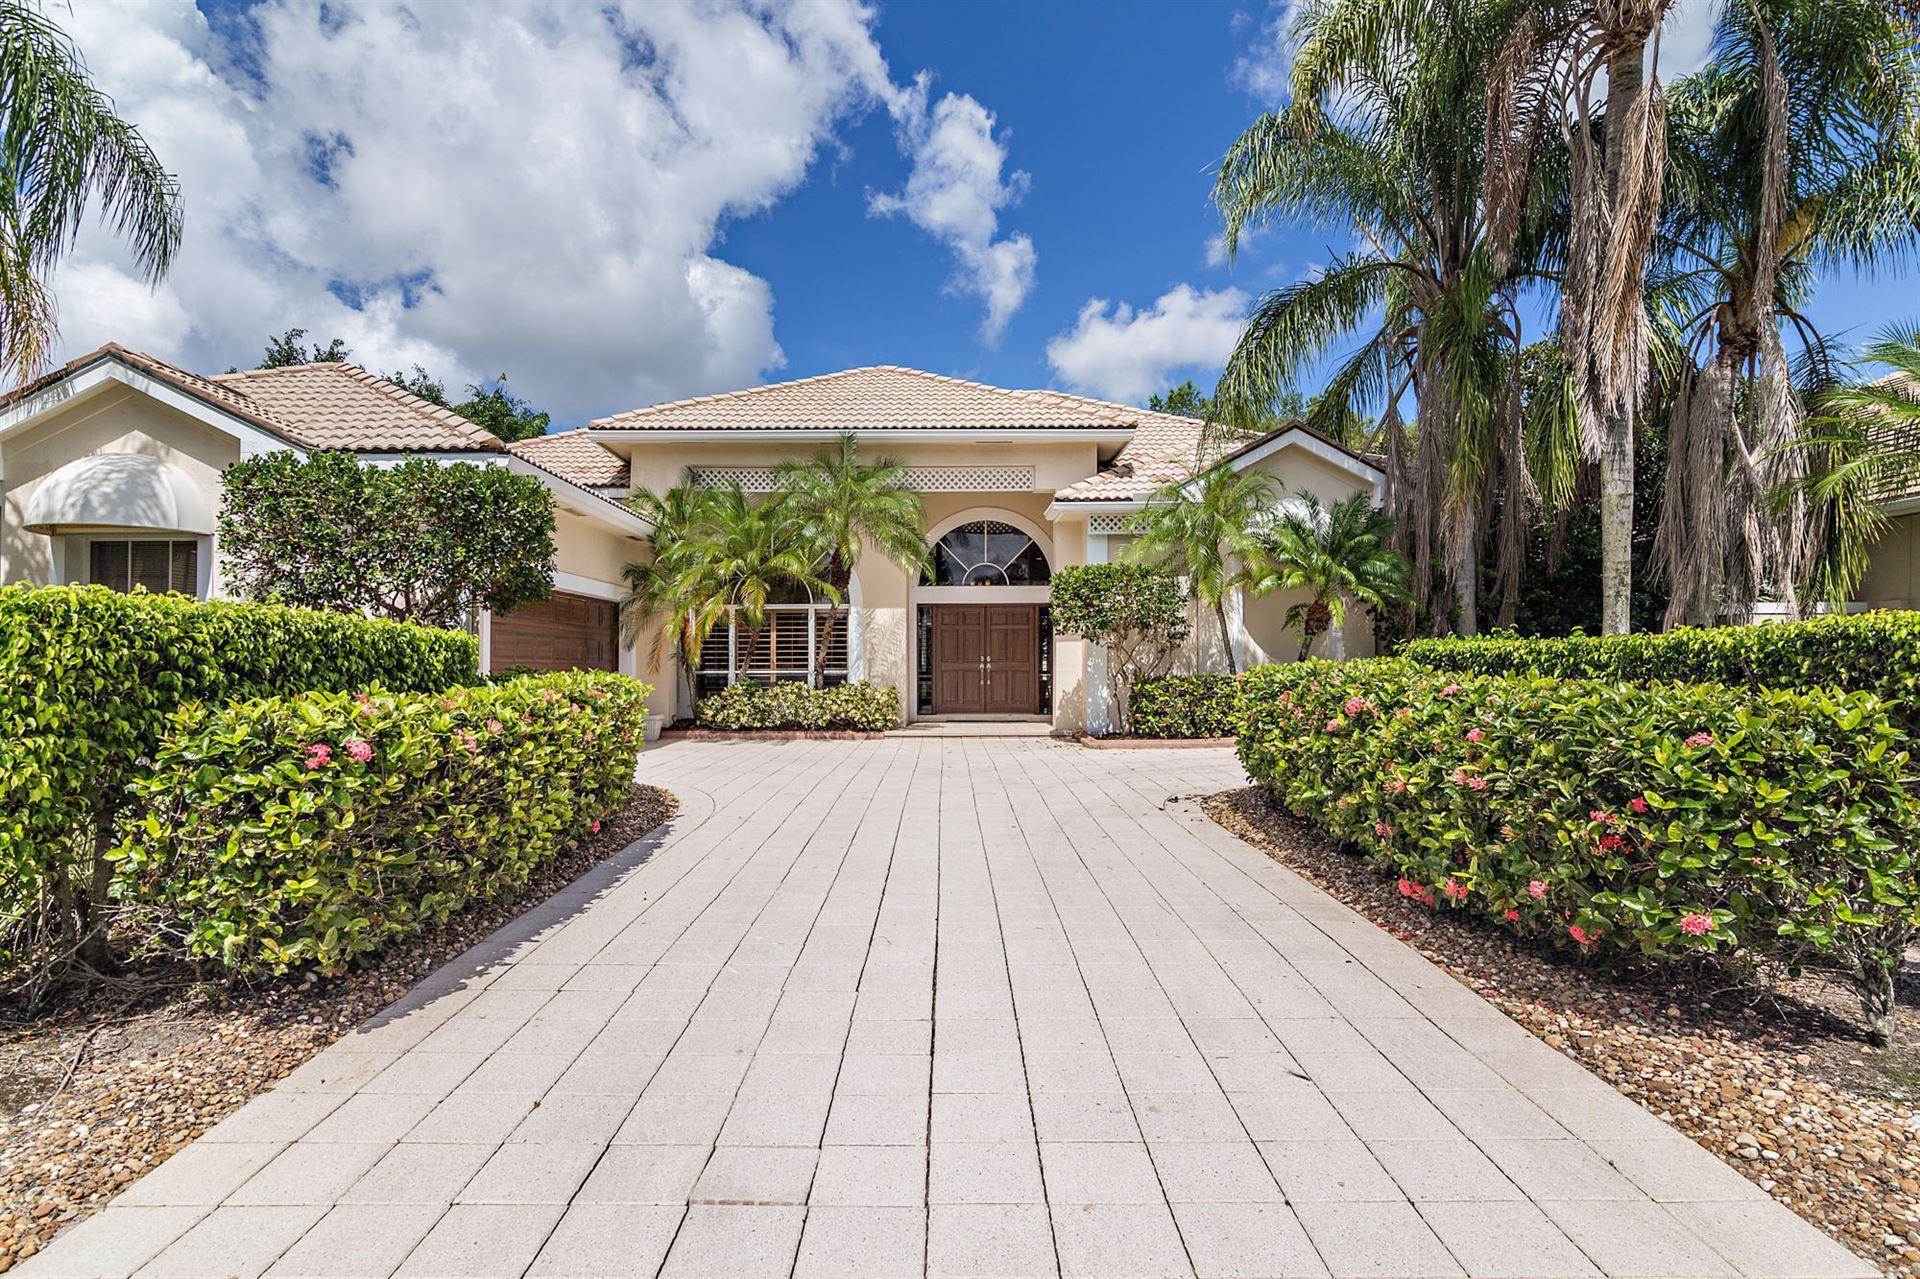 Photo of 14 Windward Isle, Palm Beach Gardens, FL 33418 (MLS # RX-10651555)